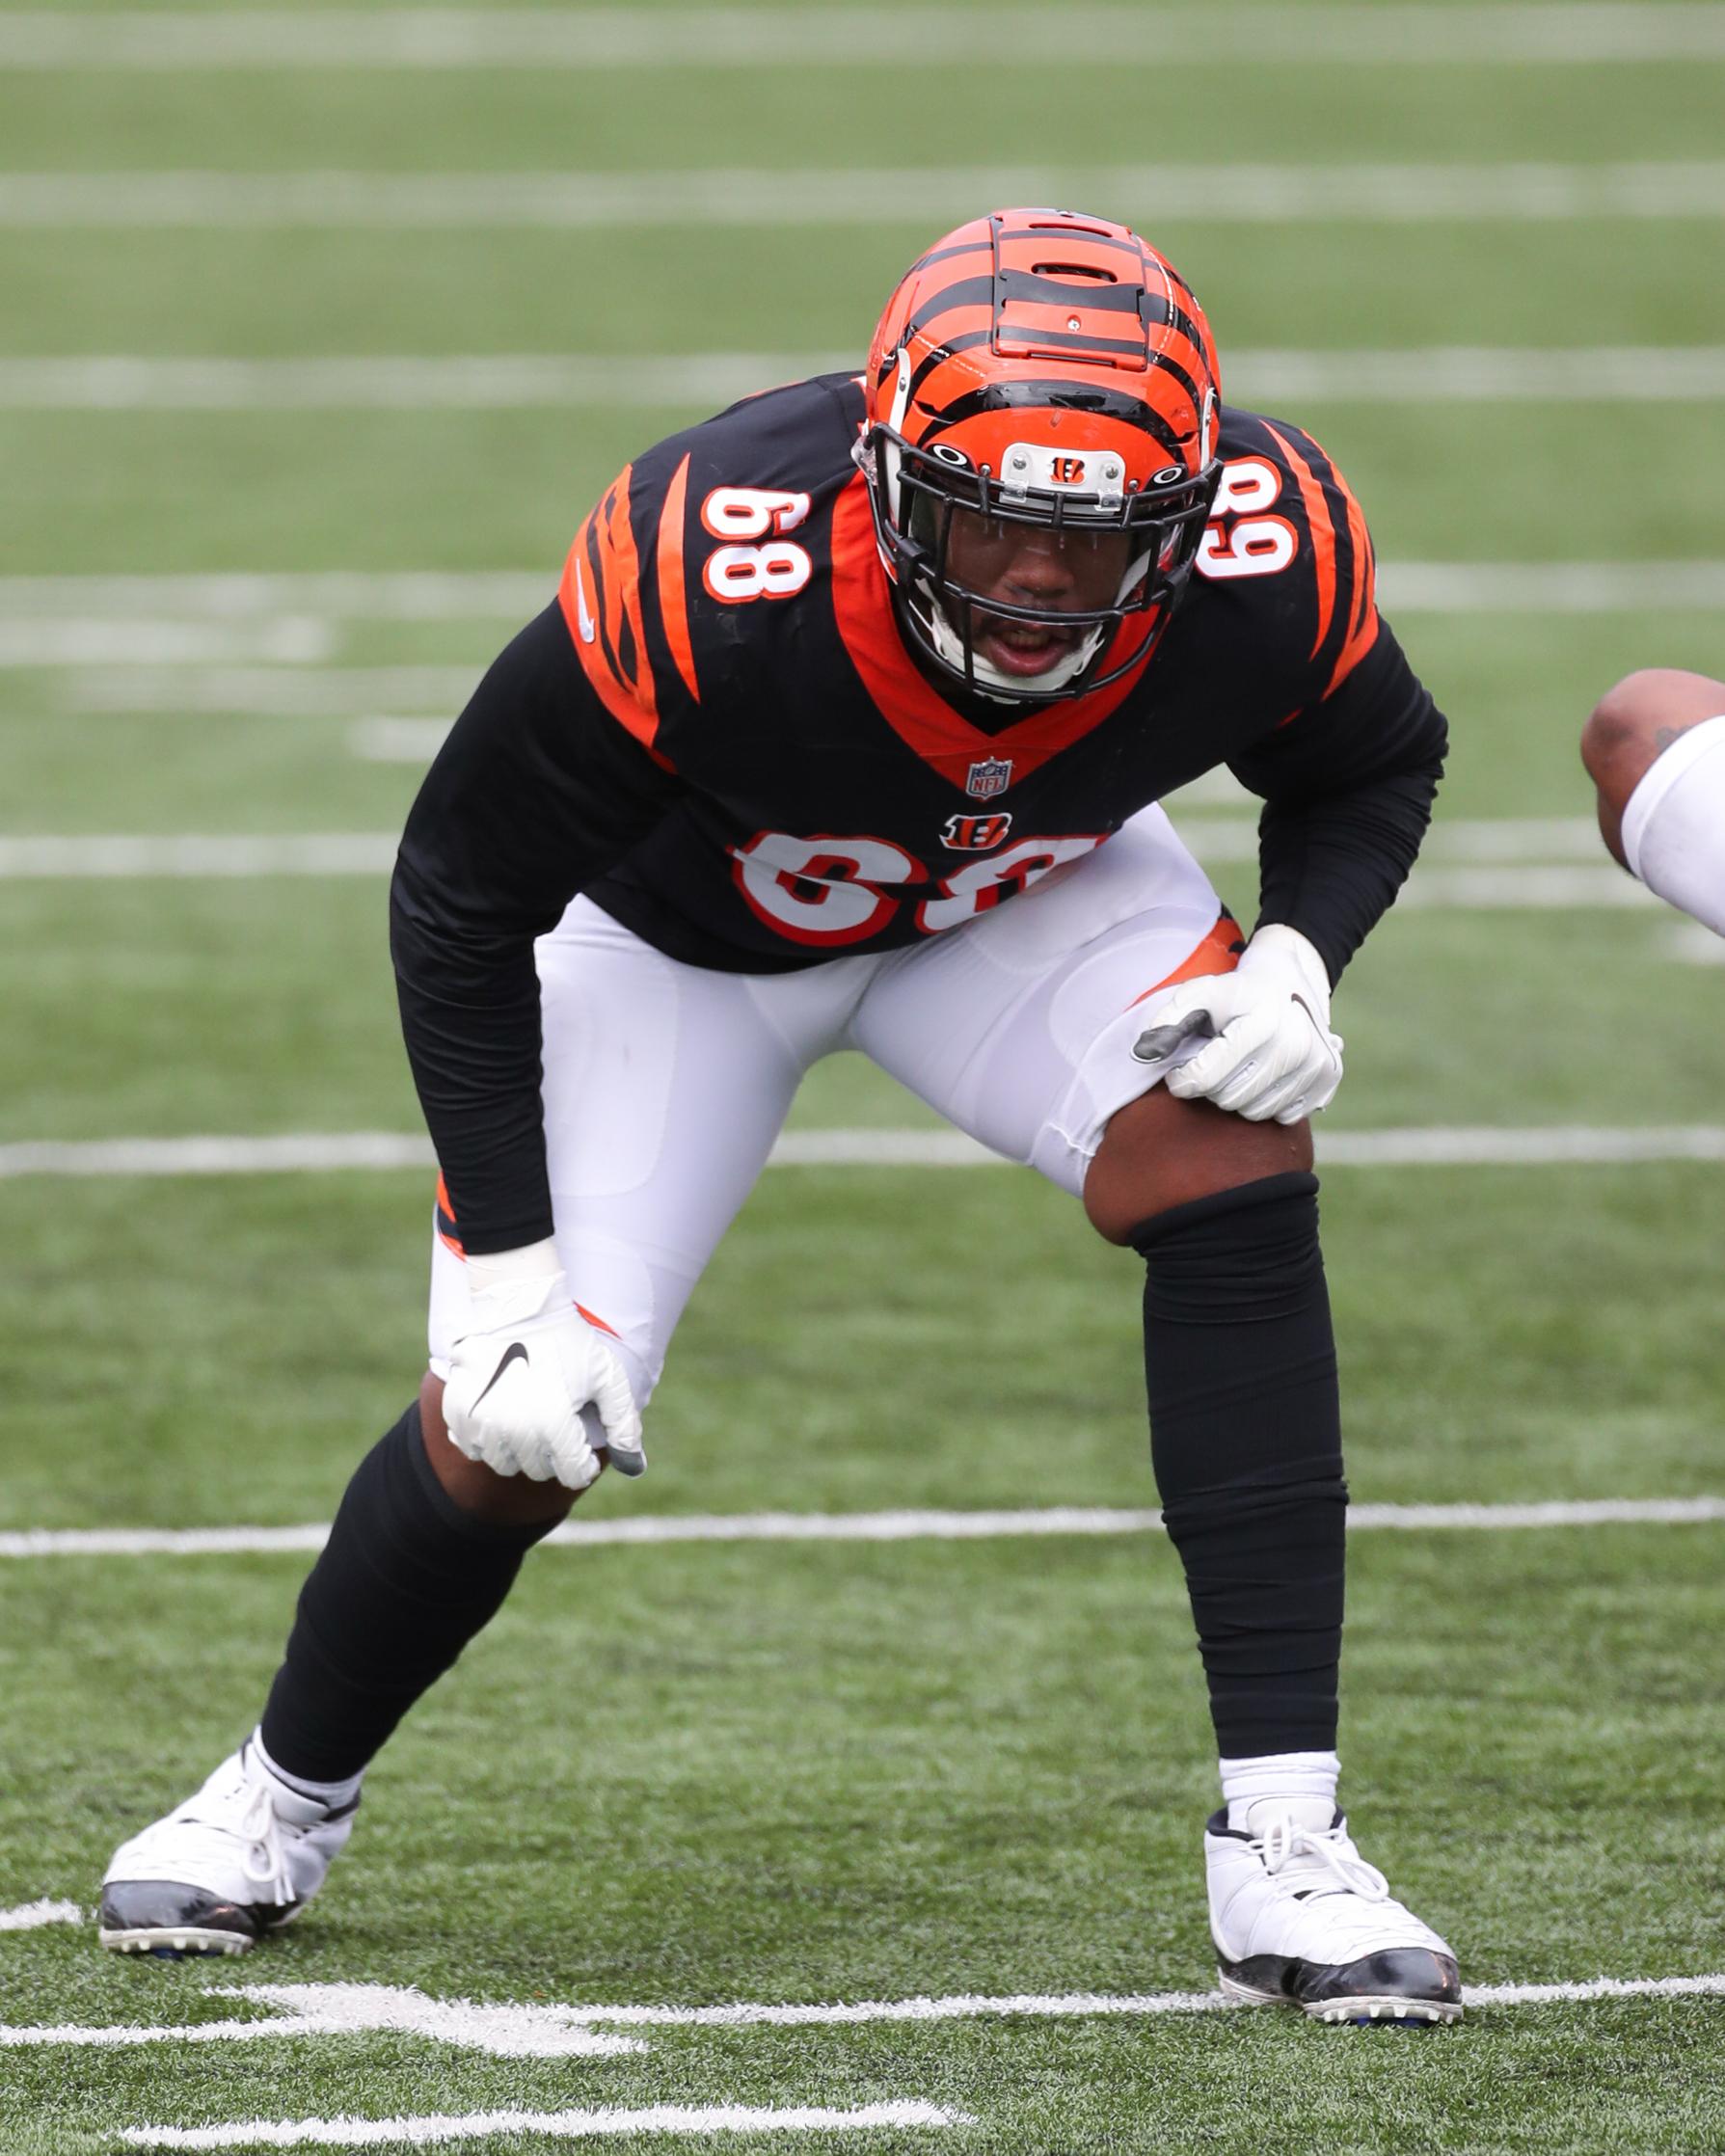 NFL: OCT 25 Browns at Bengals